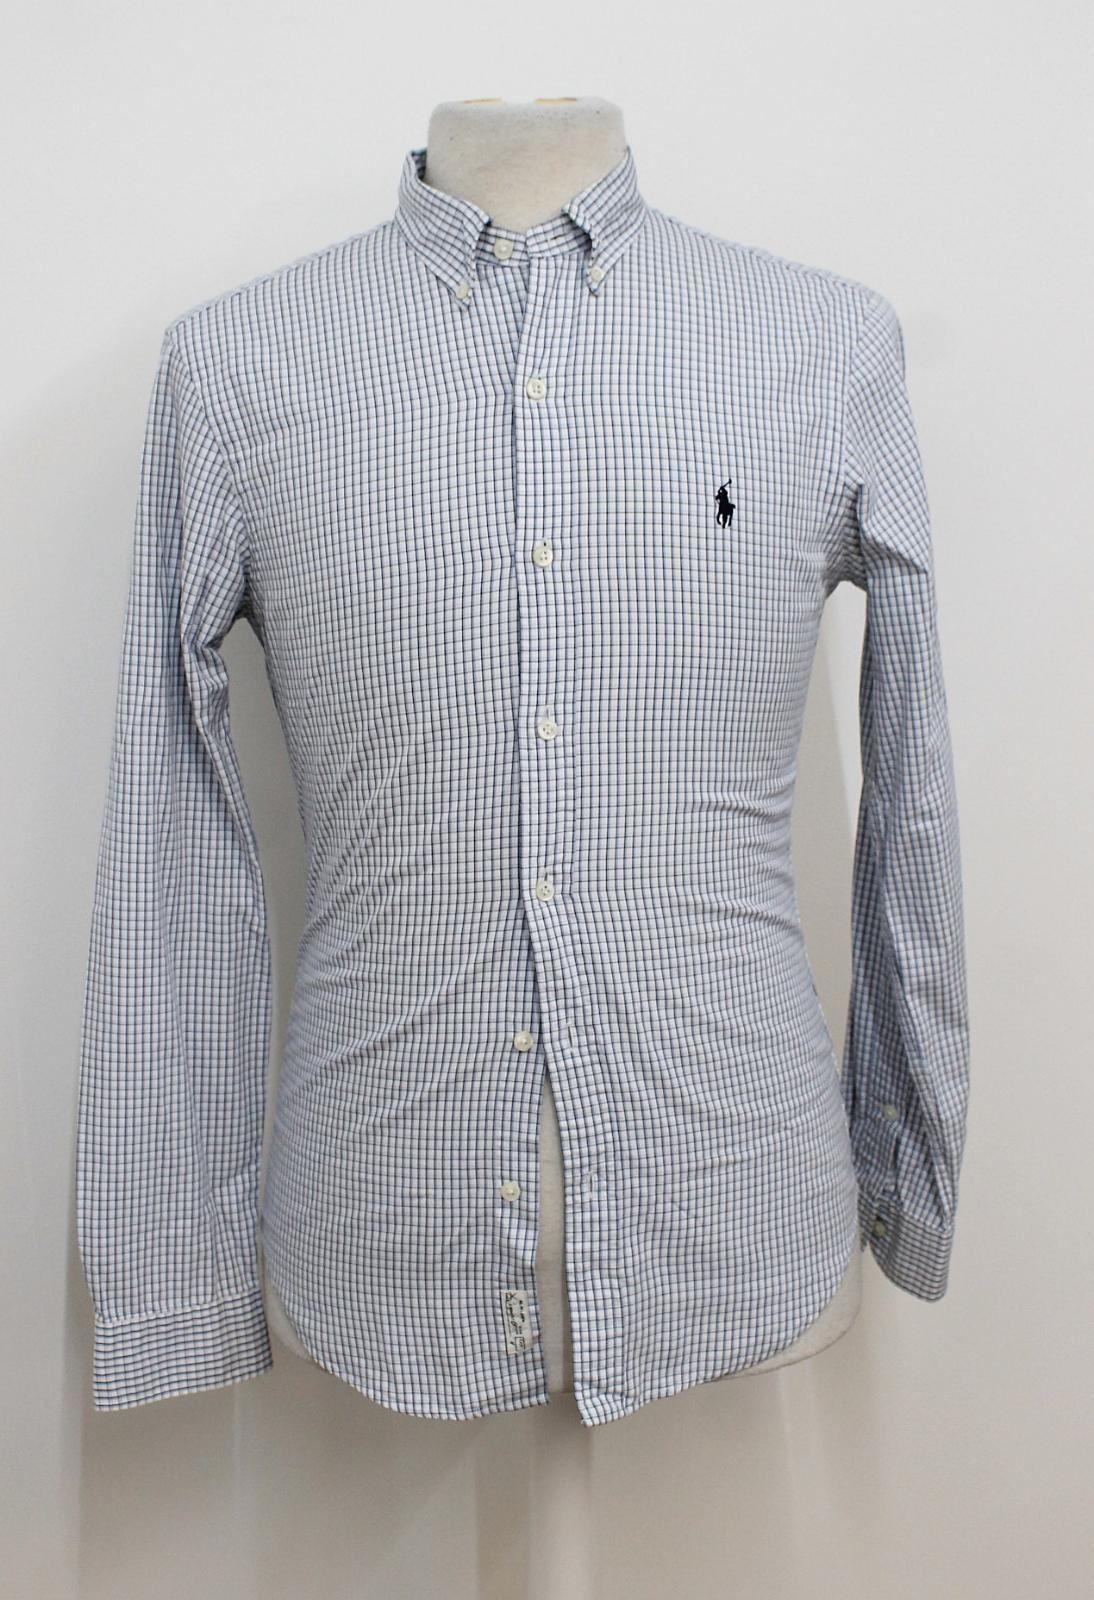 Polo-Ralph-Lauren-Para-Hombres-Blanco-Negro-Azul-Camisa-De-Patron-De-Cuadros-Slim-Fit-Talla-S